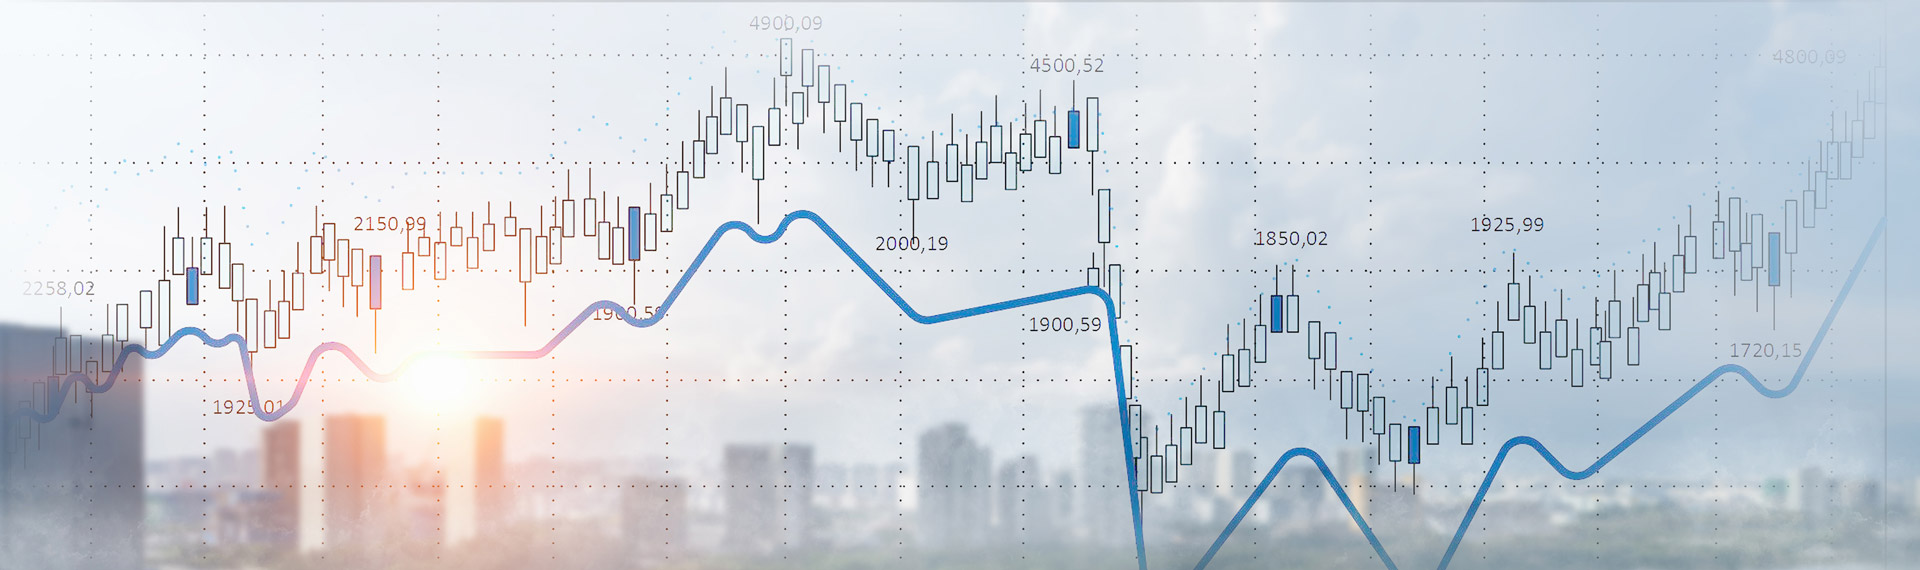 header-evolution-of-share-capital